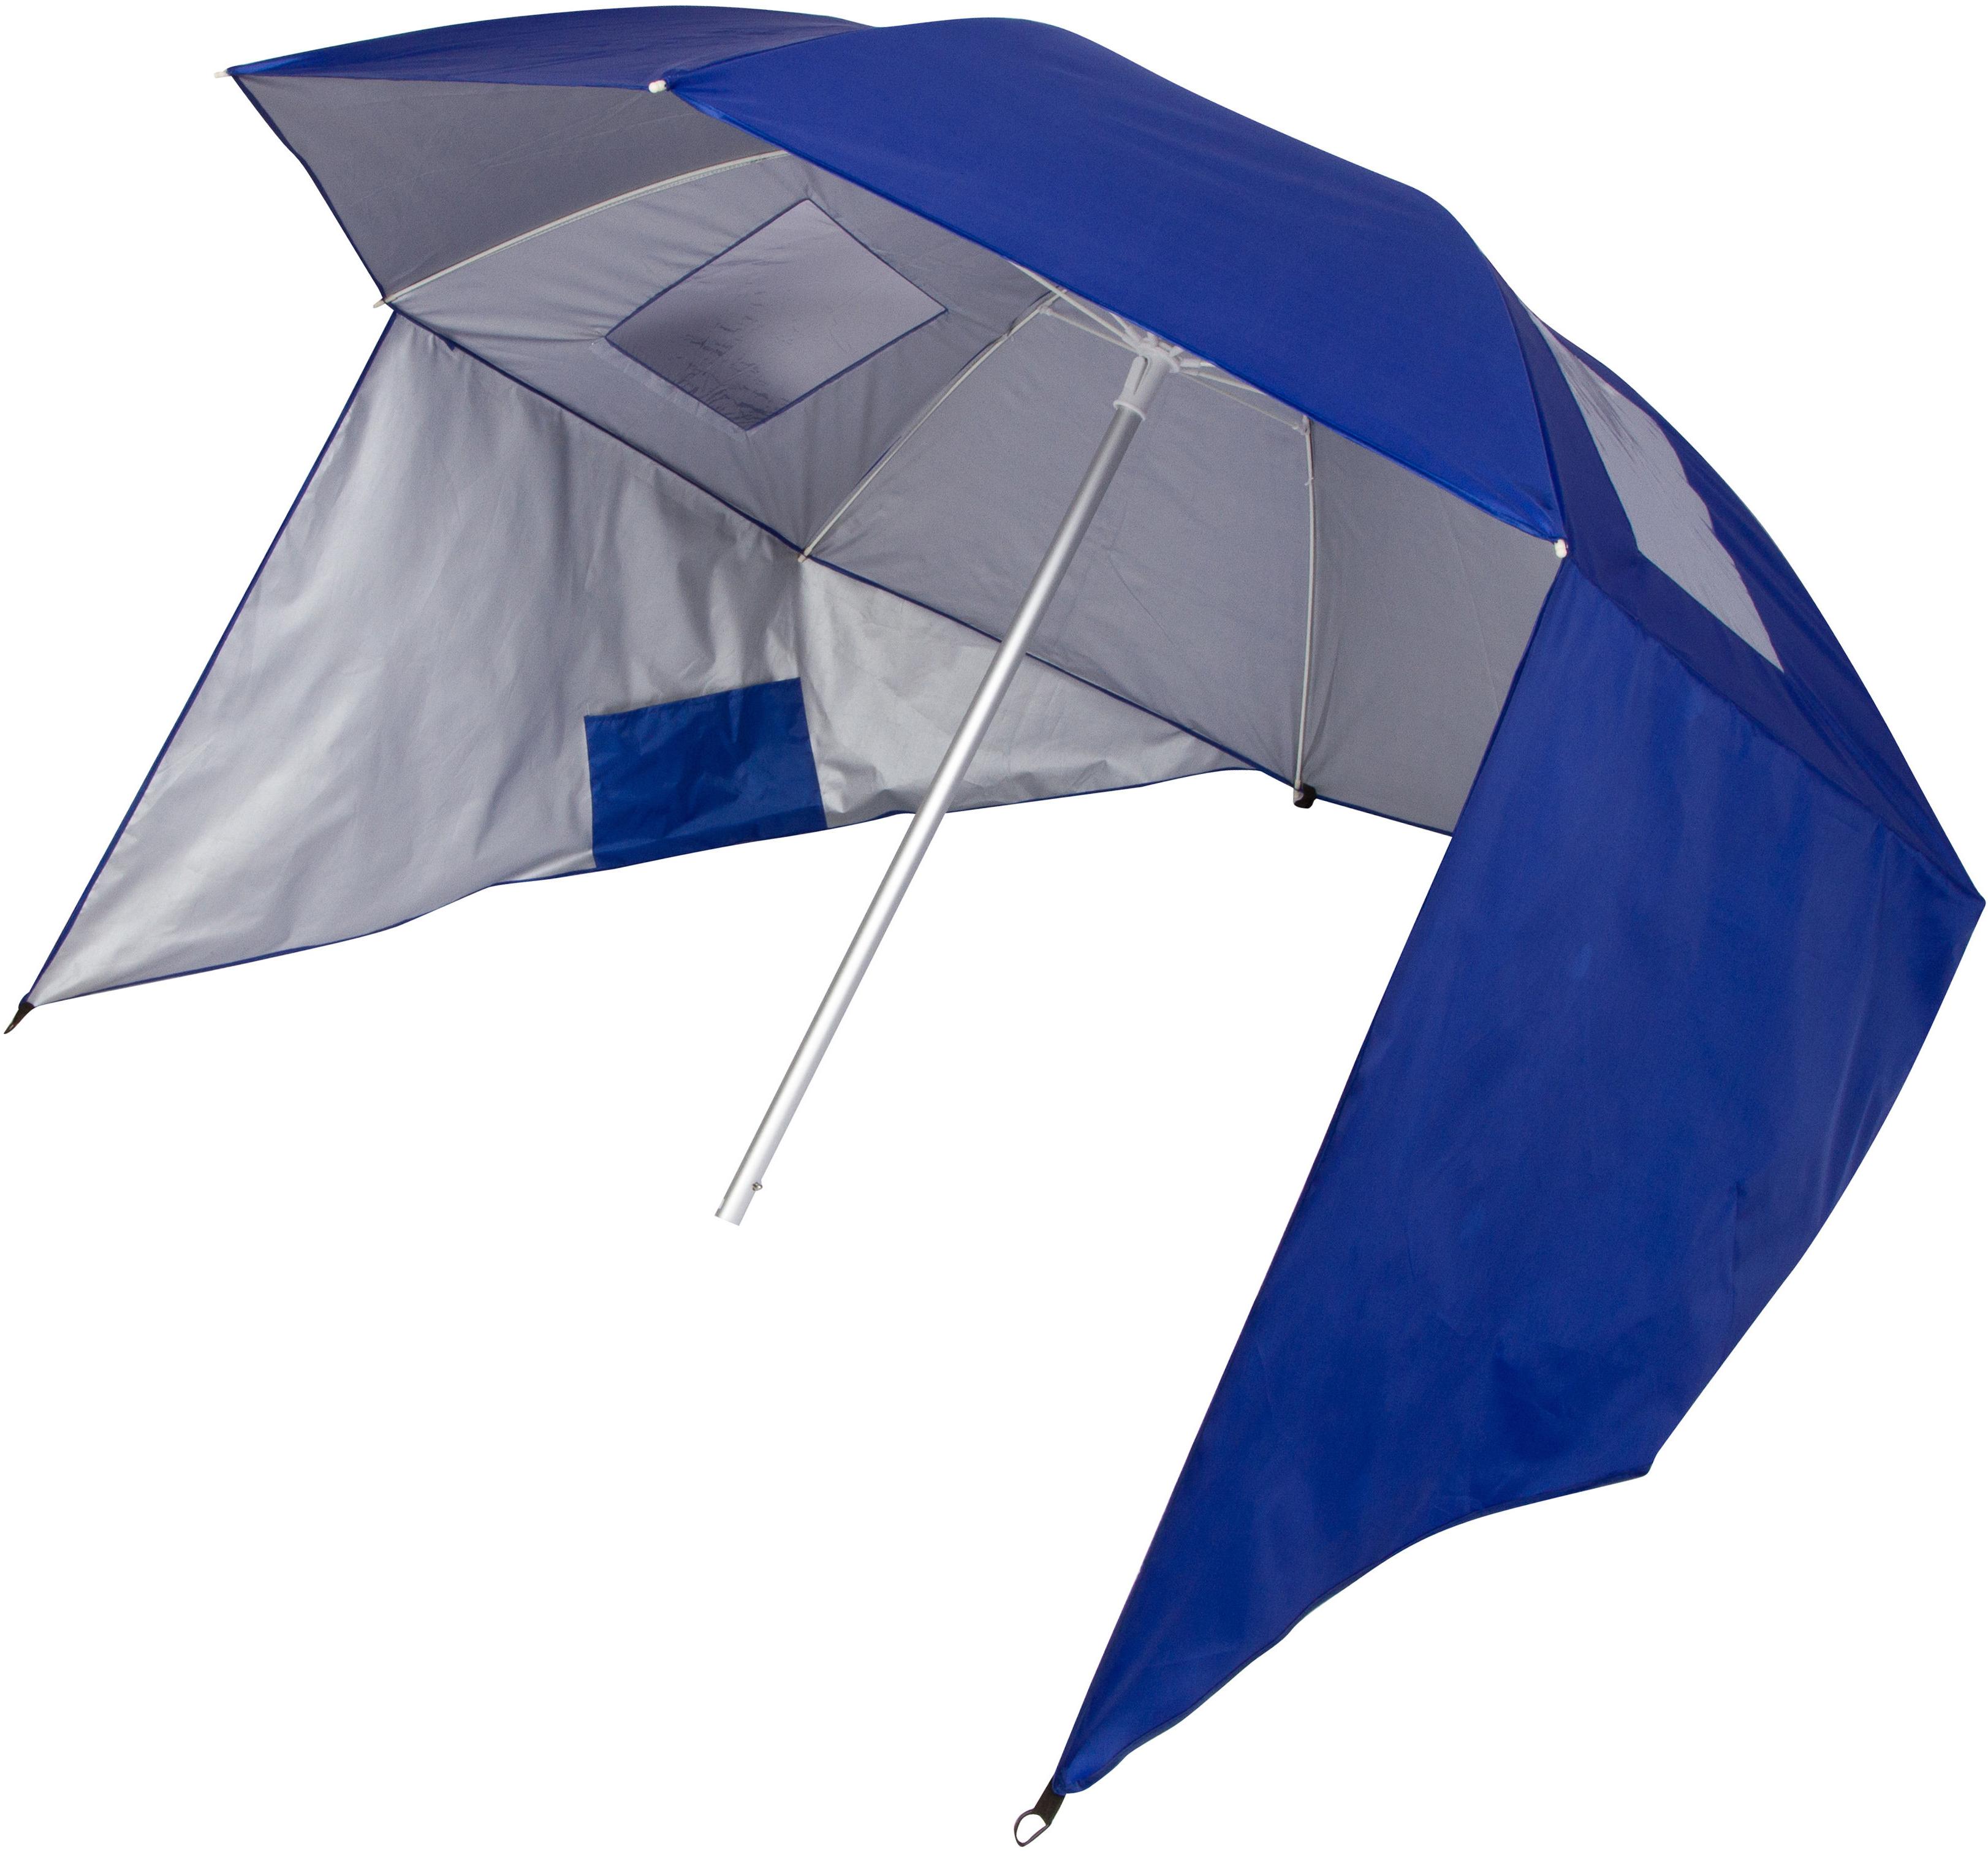 Tiara Sun Shelter 50+ Uv Protection 7' Beach Umbrella Inside Recent Alyson Joeshade Beach Umbrellas (View 10 of 20)